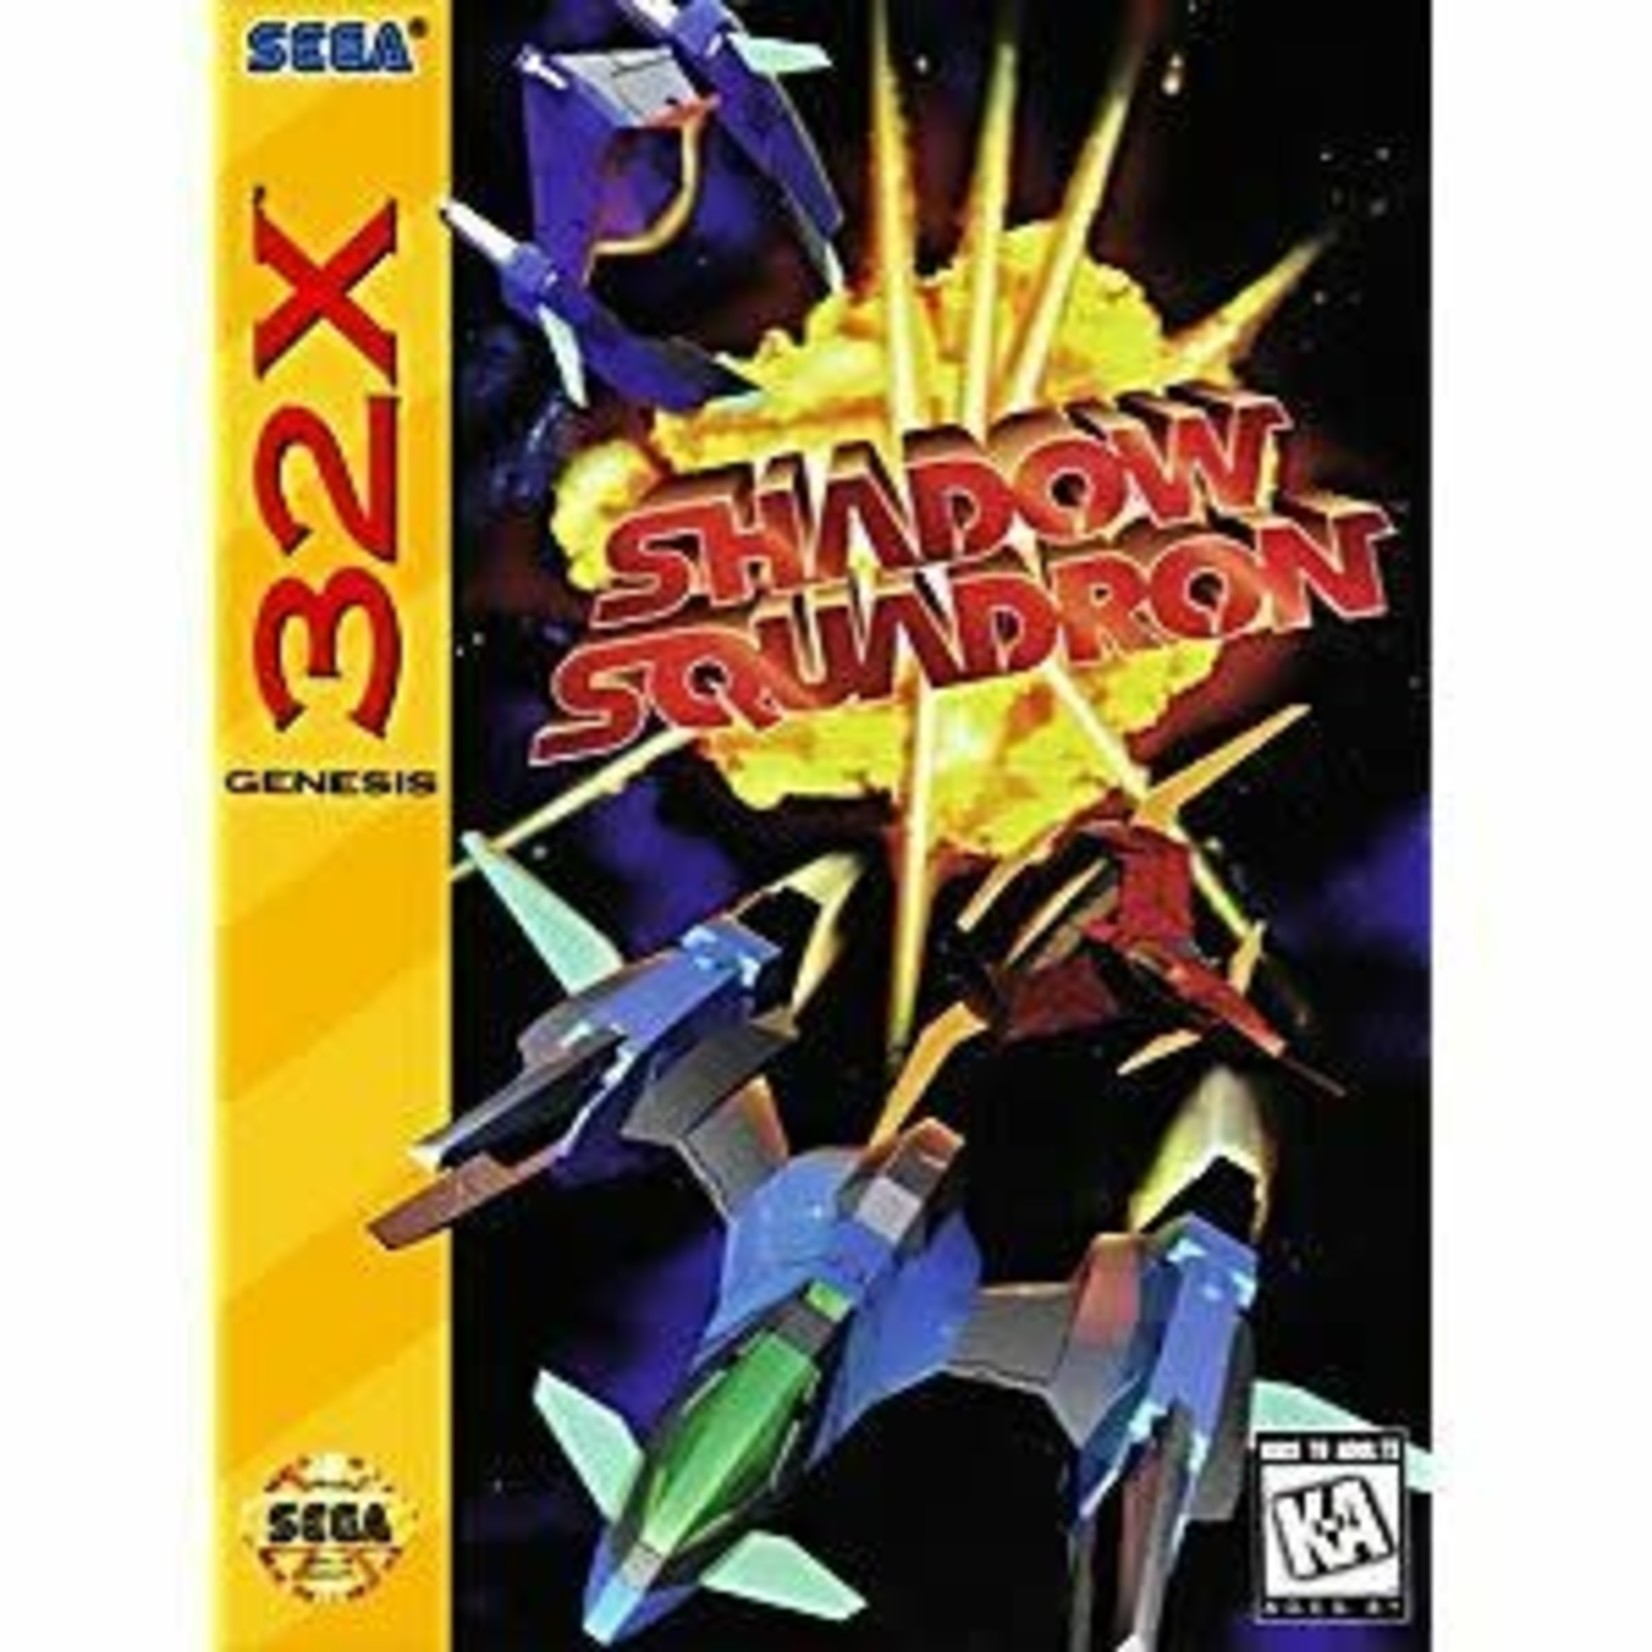 32Xu-Shadow Squadron (cartridge)